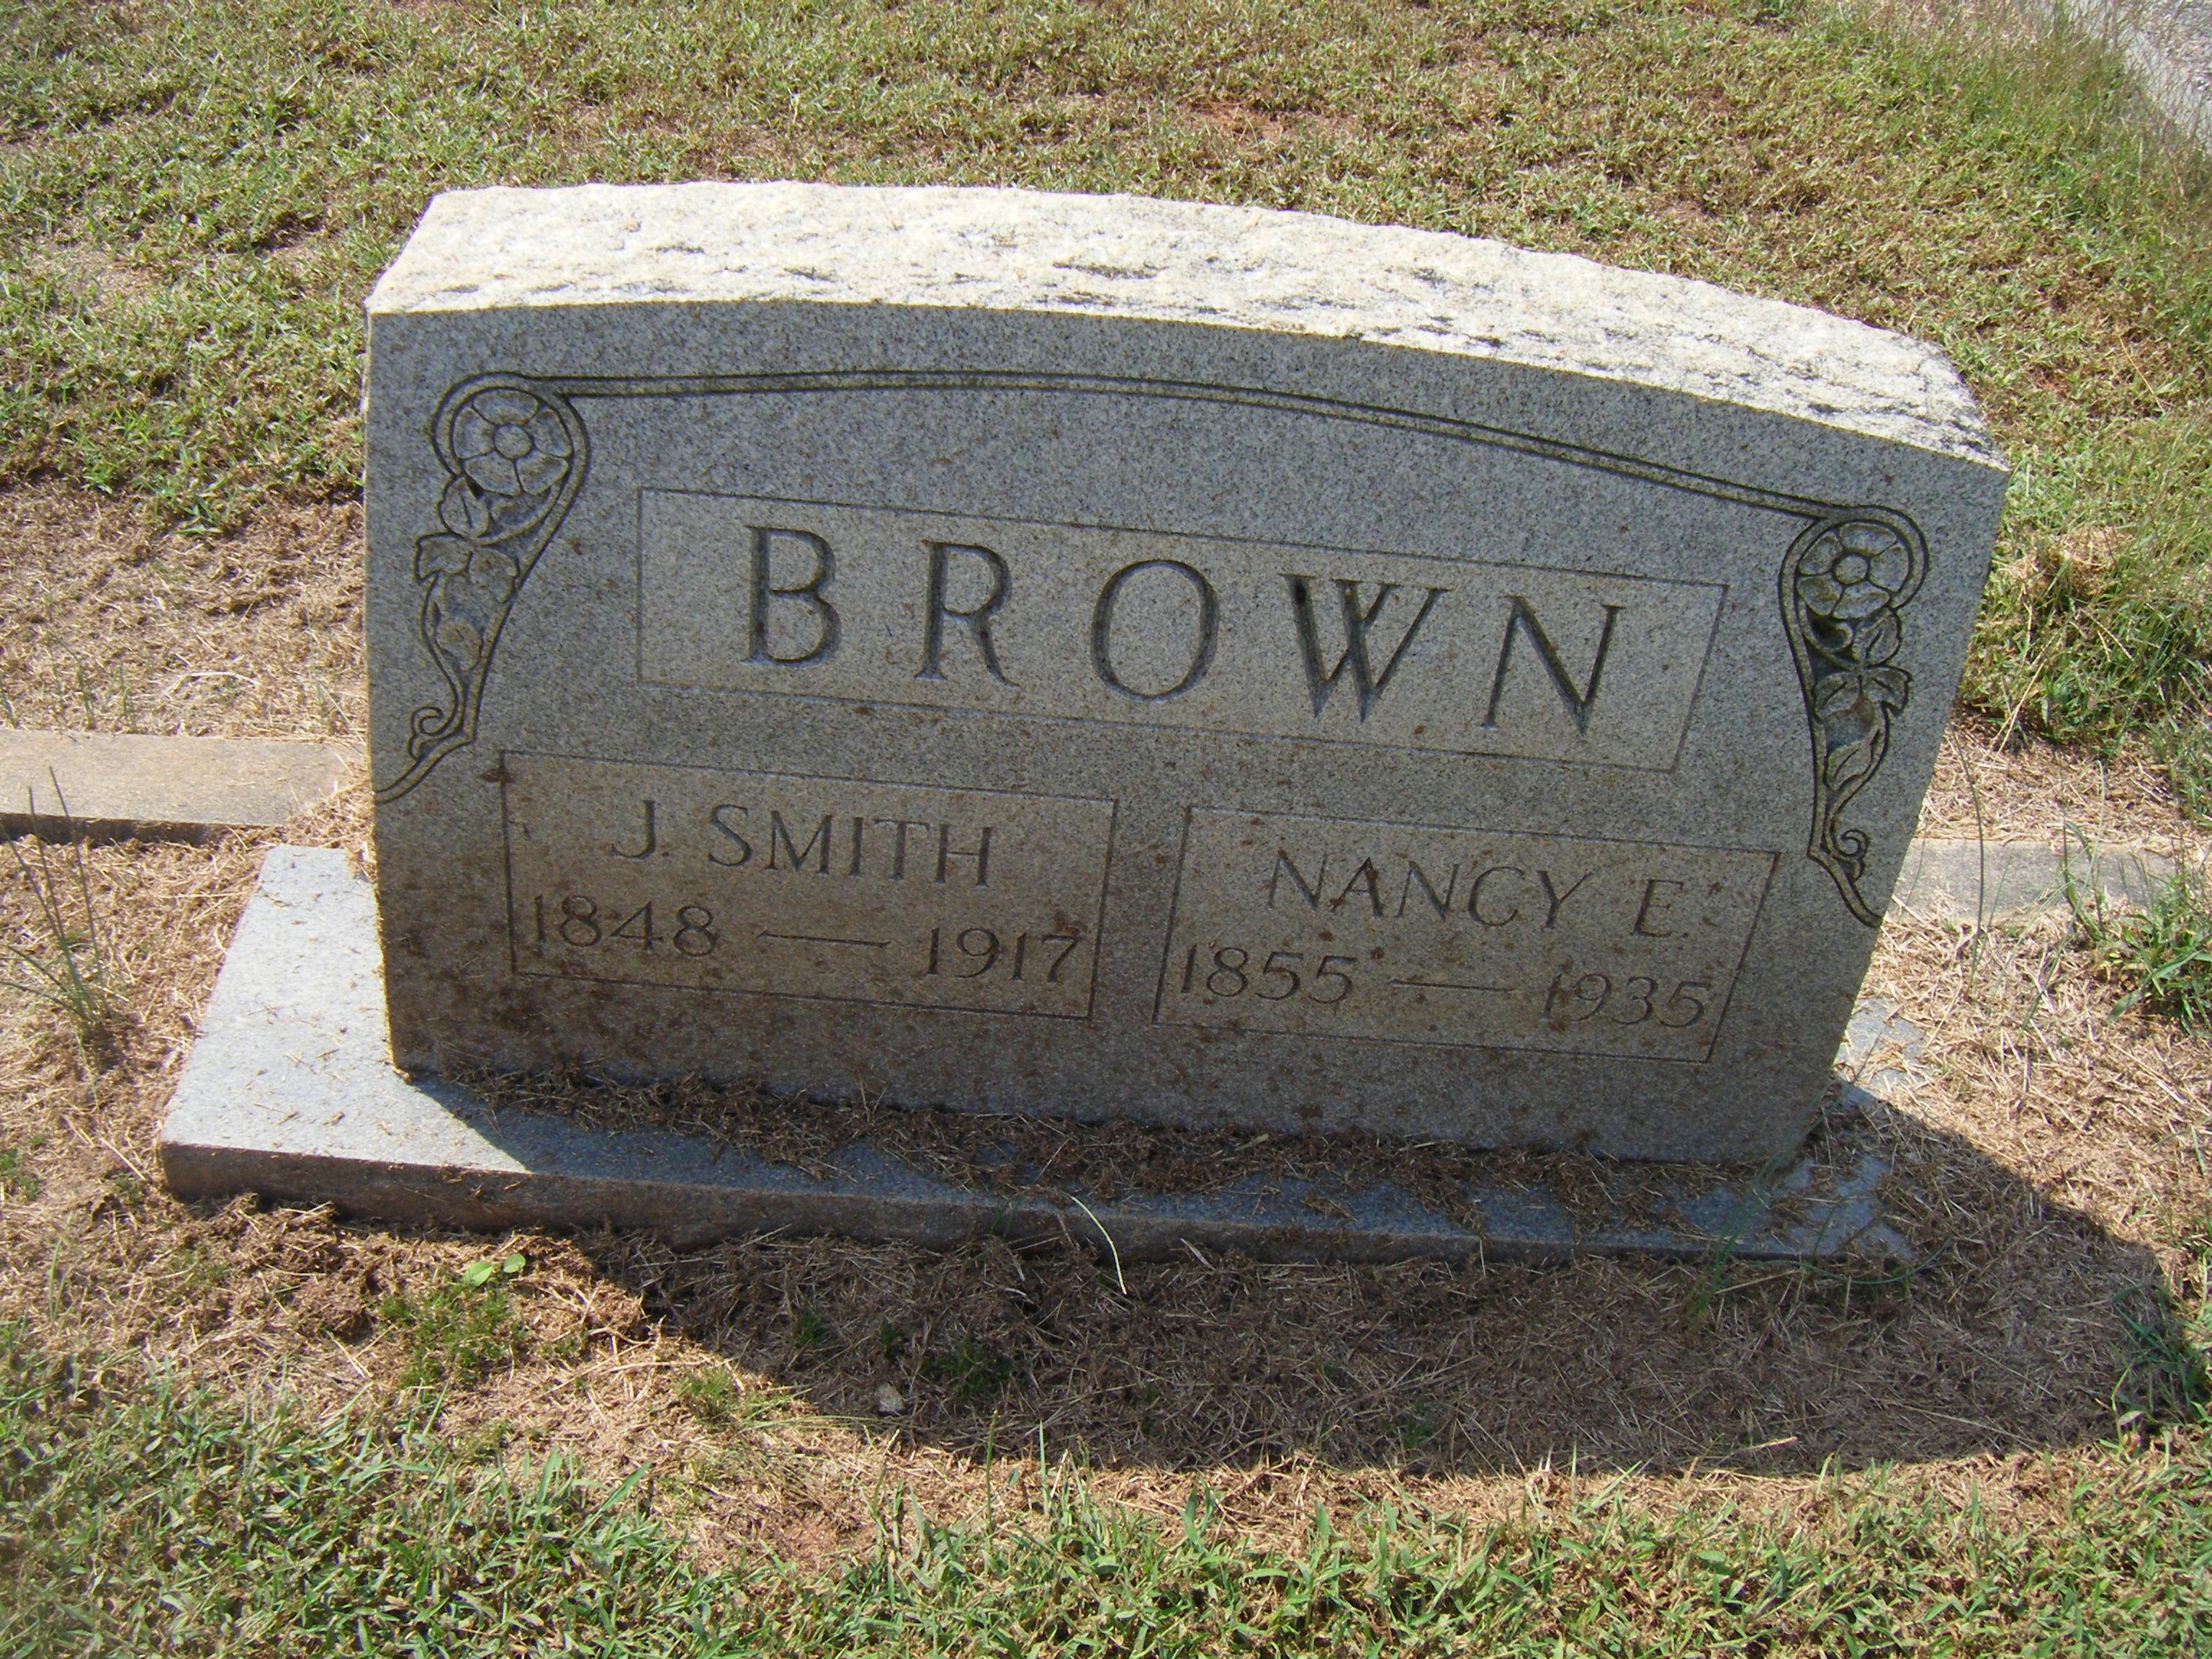 J. Smith Brown